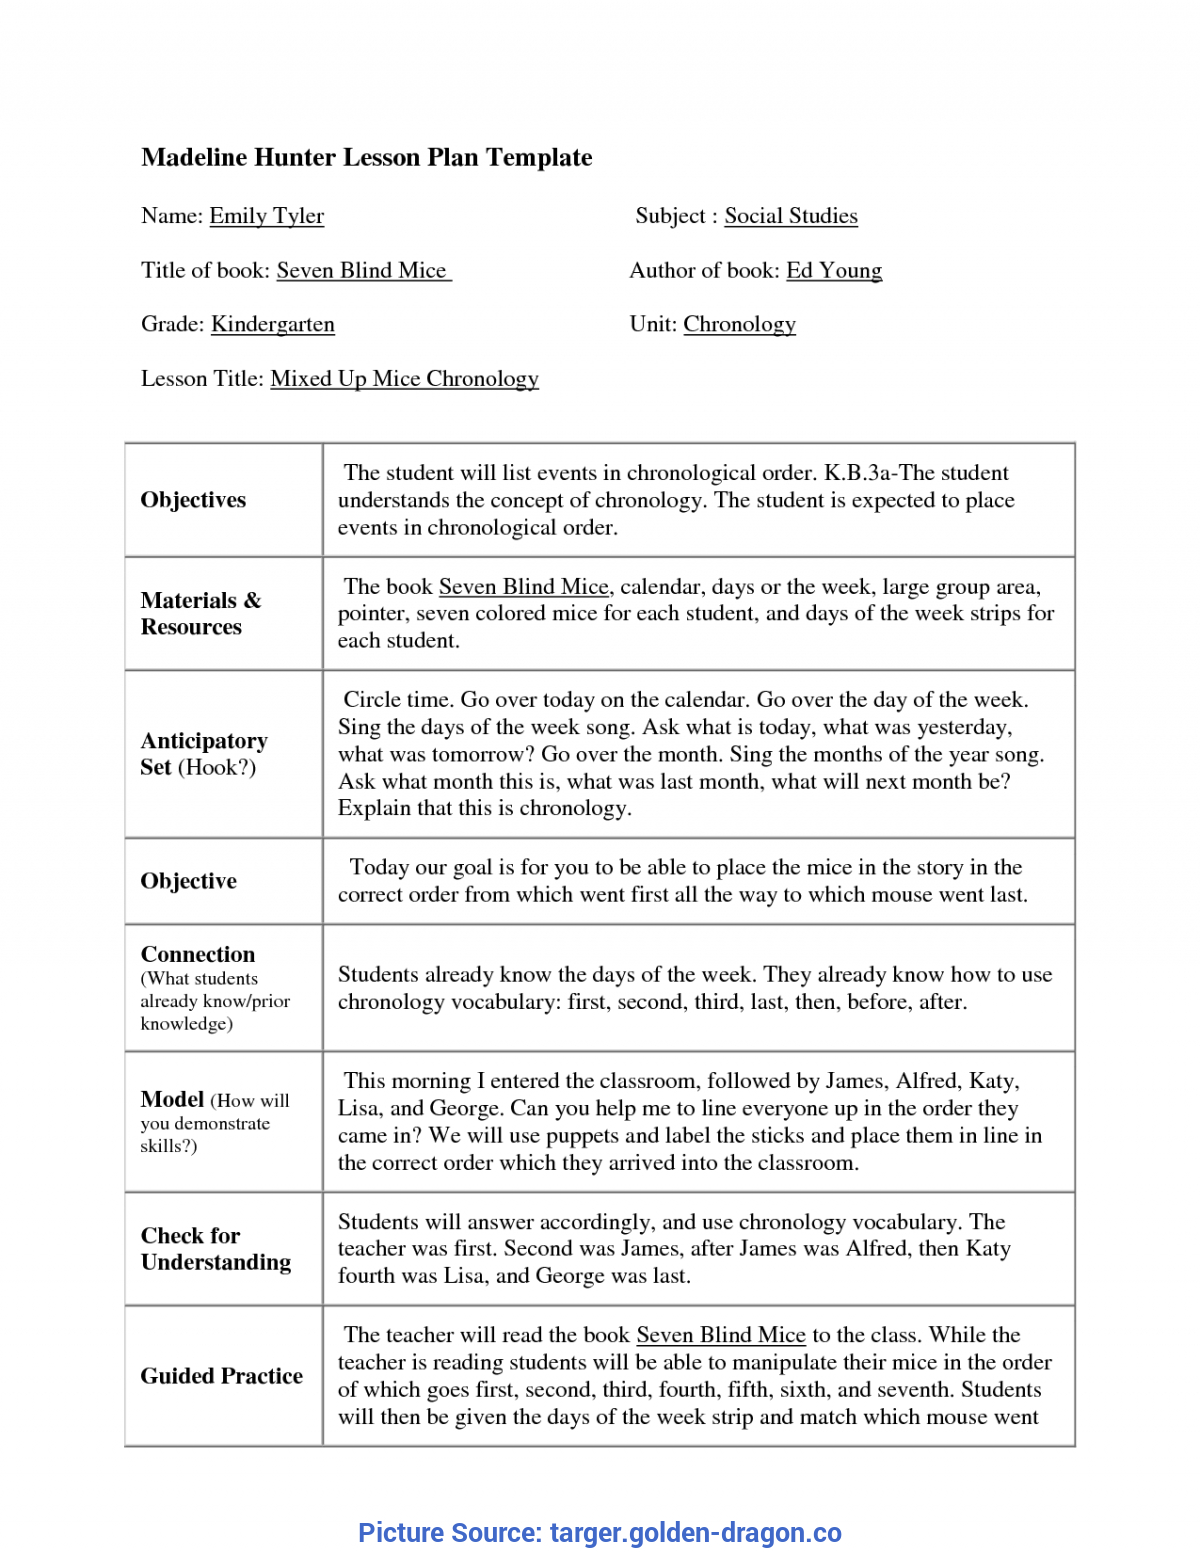 Top Madeline Hunter Lesson Plan Kindergarten Madeline Hunter Lesson In Madeline Hunter Lesson Plan Blank Template